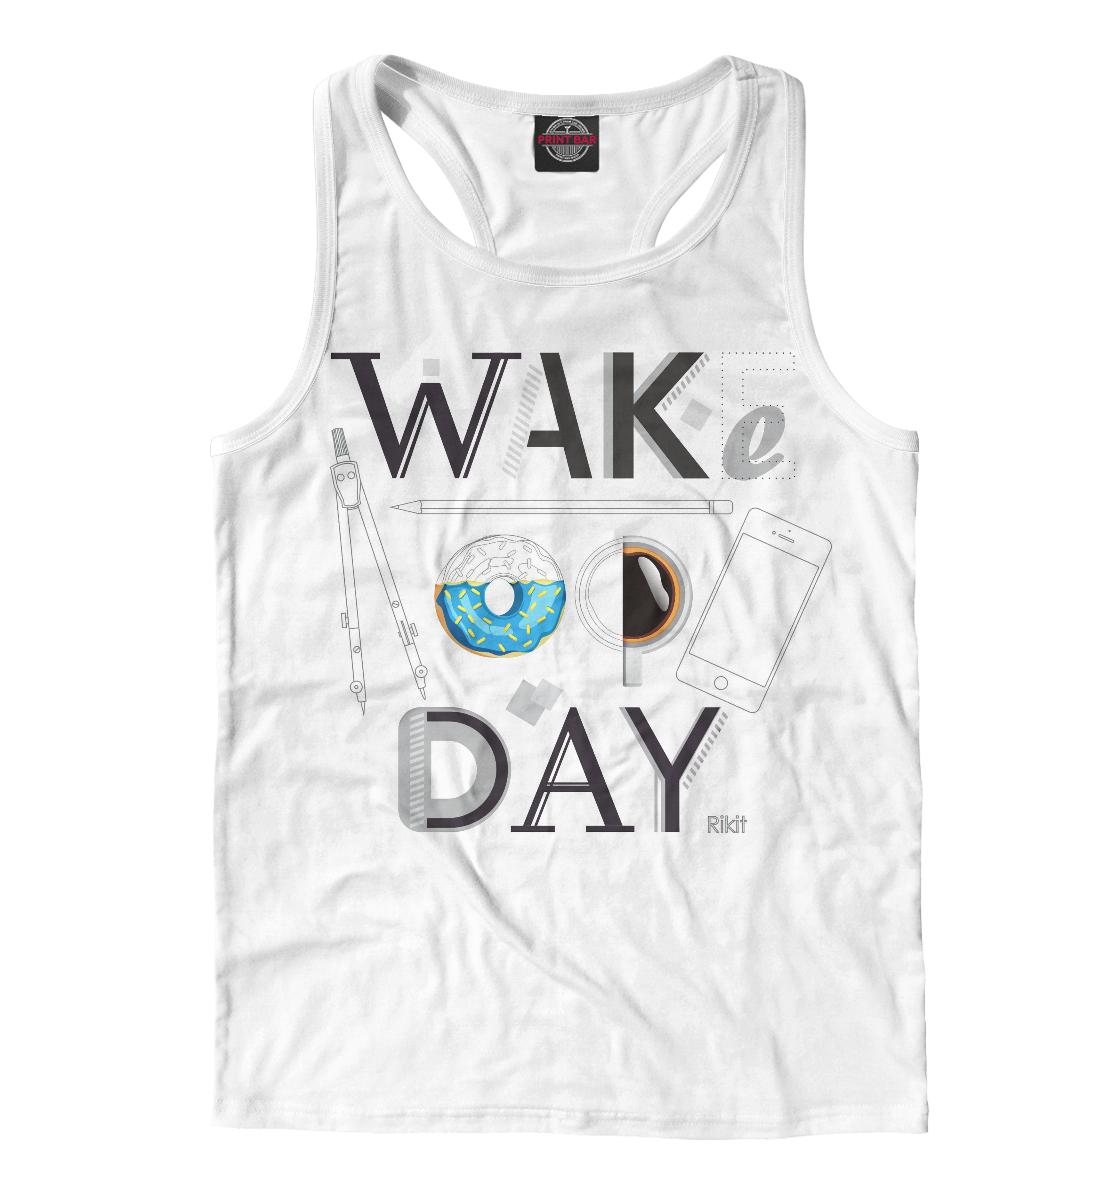 Купить Say wake up day, Printbar, Майки борцовки, DZN-819456-mayb-2